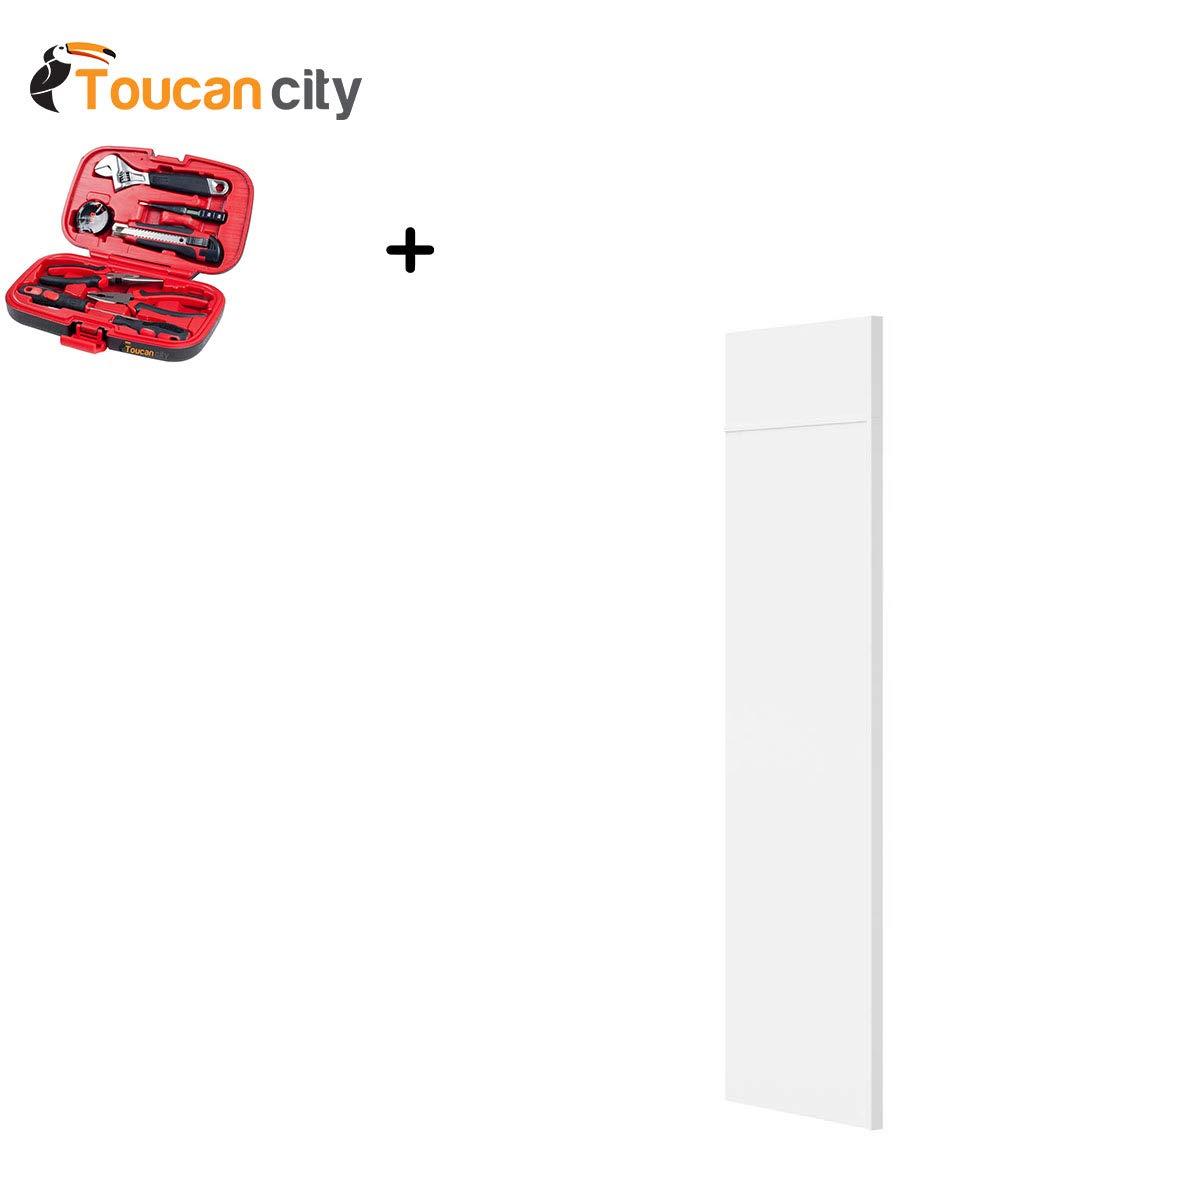 Toucan City Tool Kit (9-Piece) and Hampton Bay 1.5x84x24 in. Refrigerator End Panel in Satin White KAREP-SW